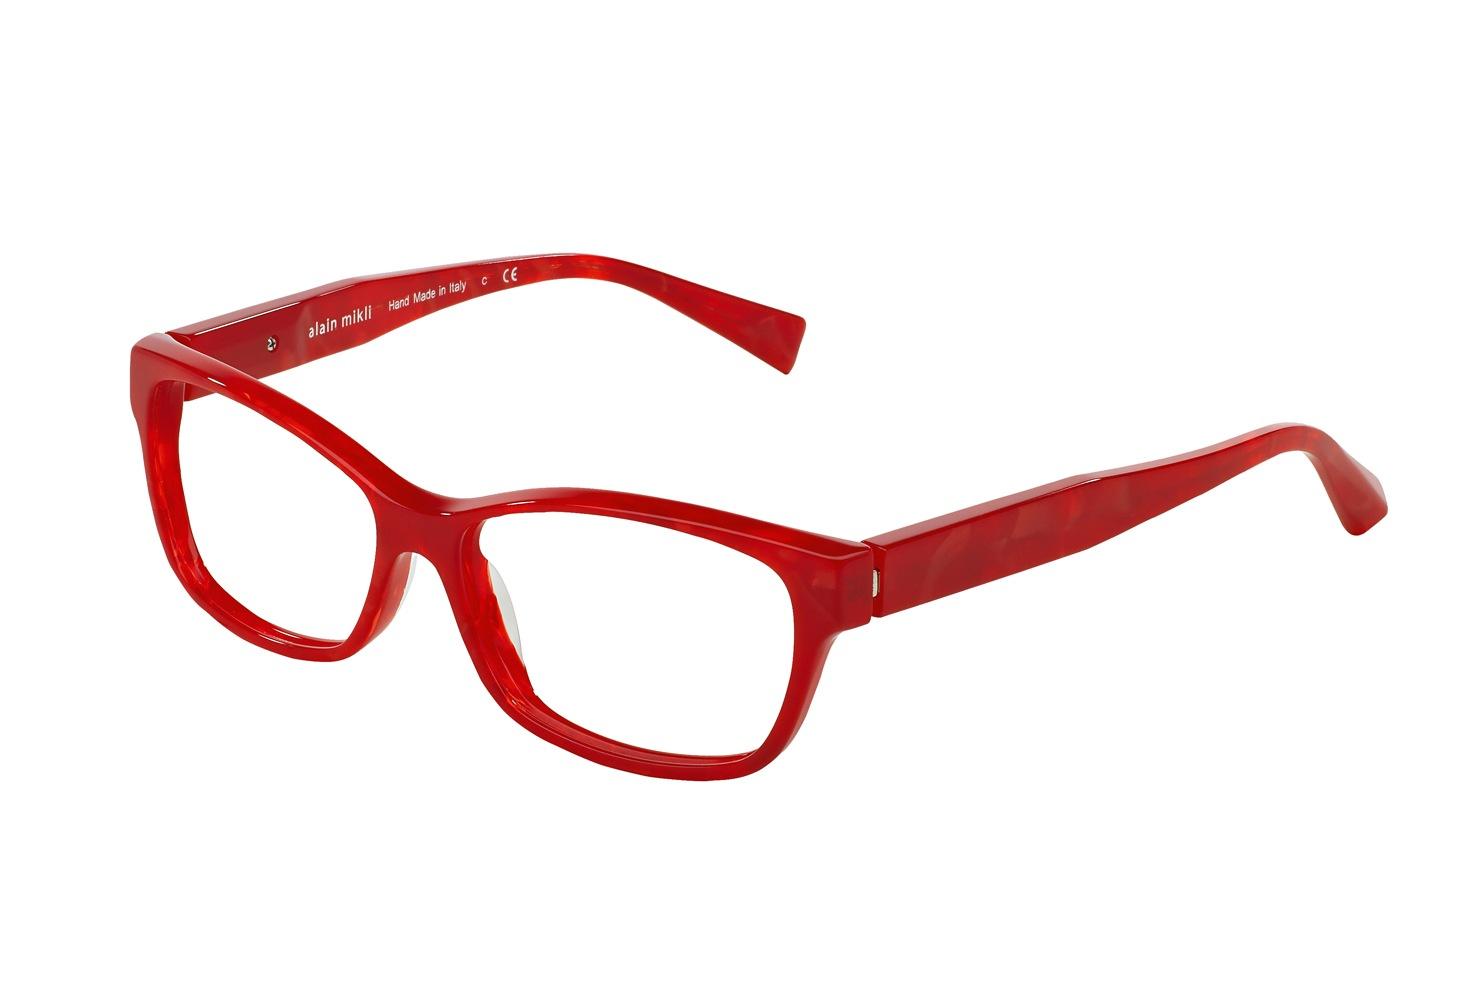 f07ee366c194 Alain Mikli Designer Eyewear A03023 Eyeglasses Artemedica